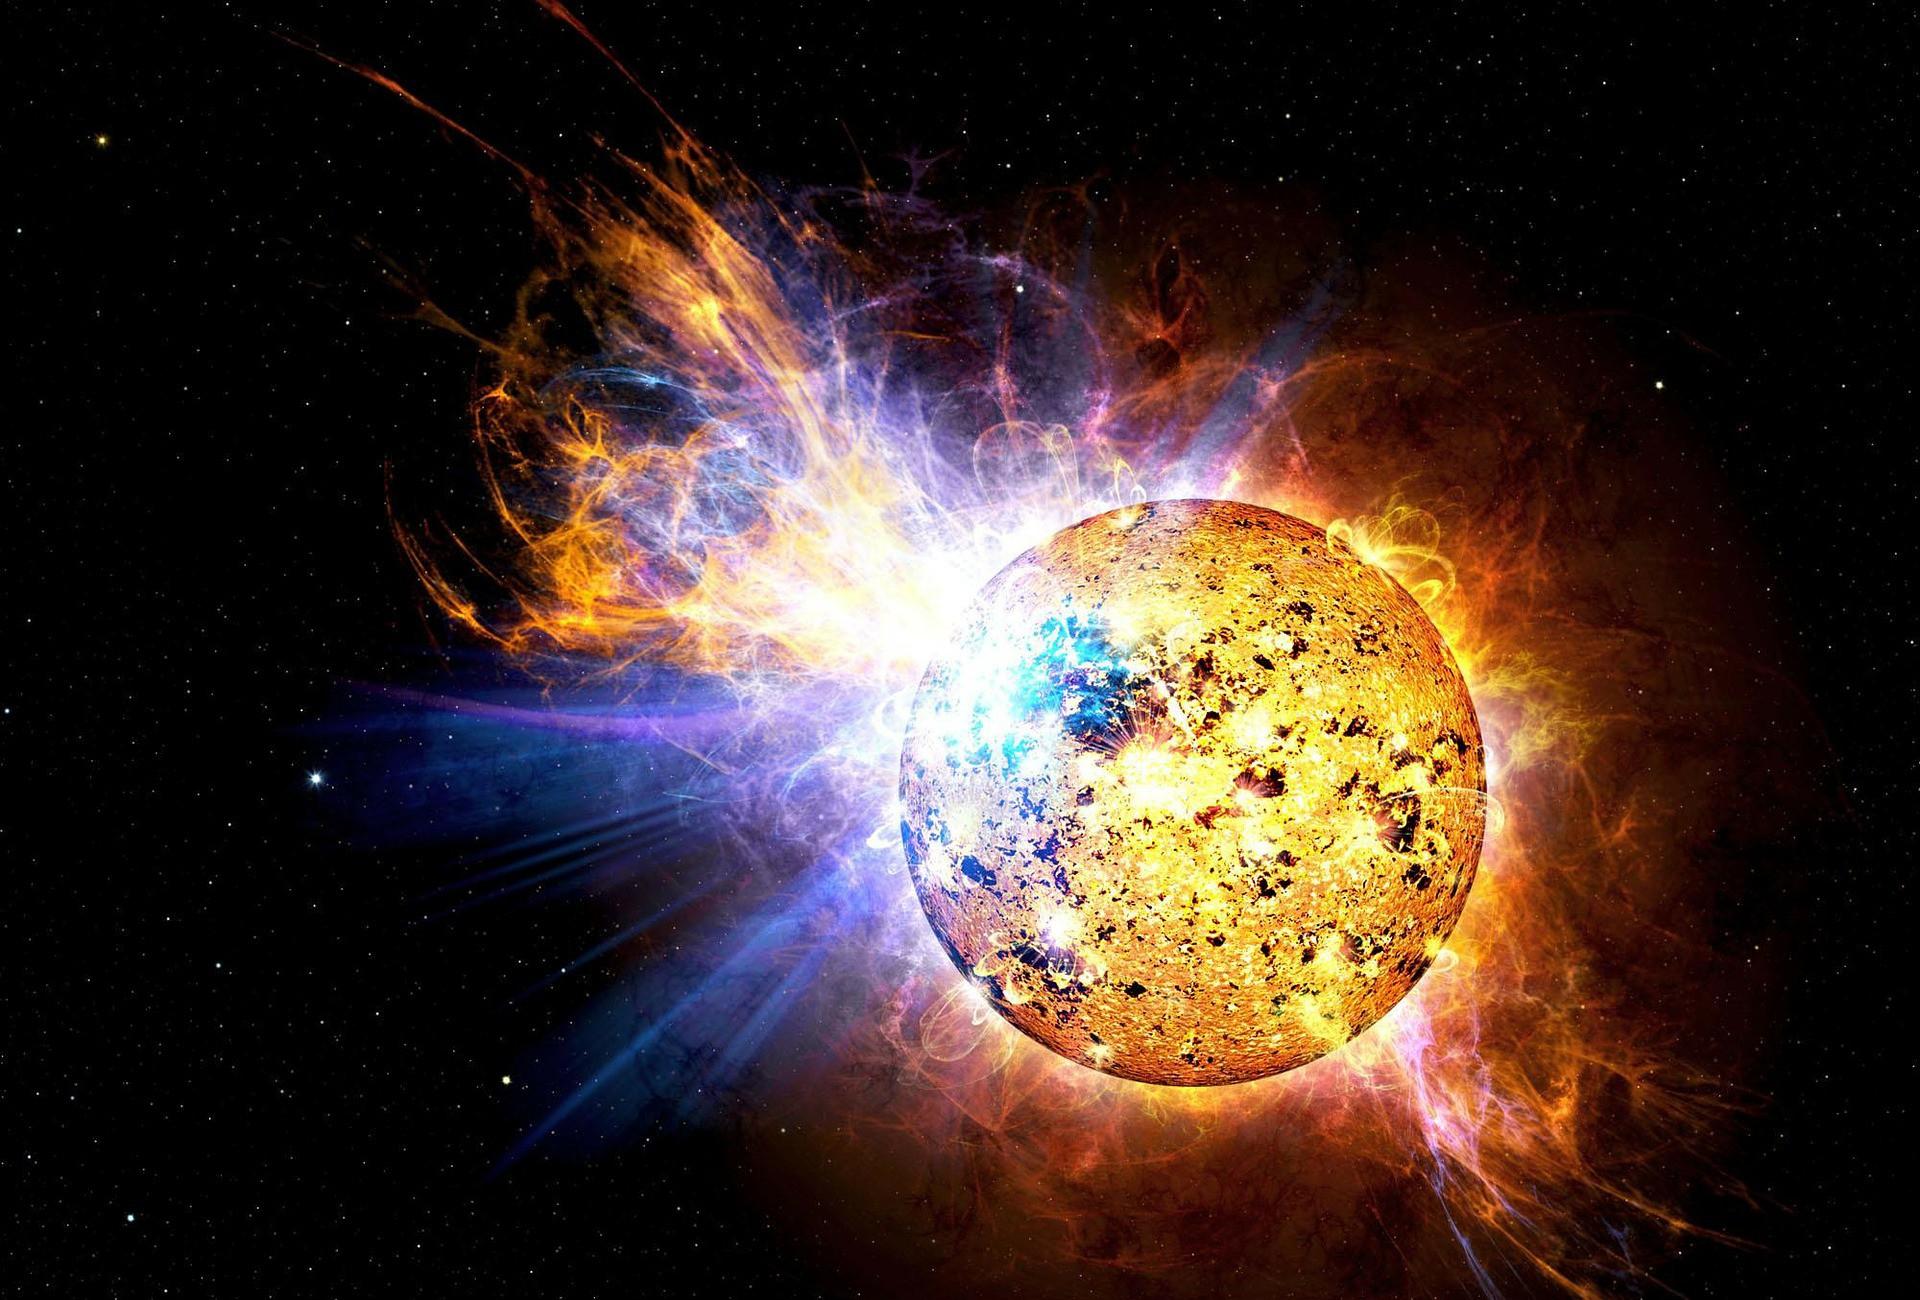 slnko krystal obrovsky tazky velmi vesmir krystalizacia miliardy rokov